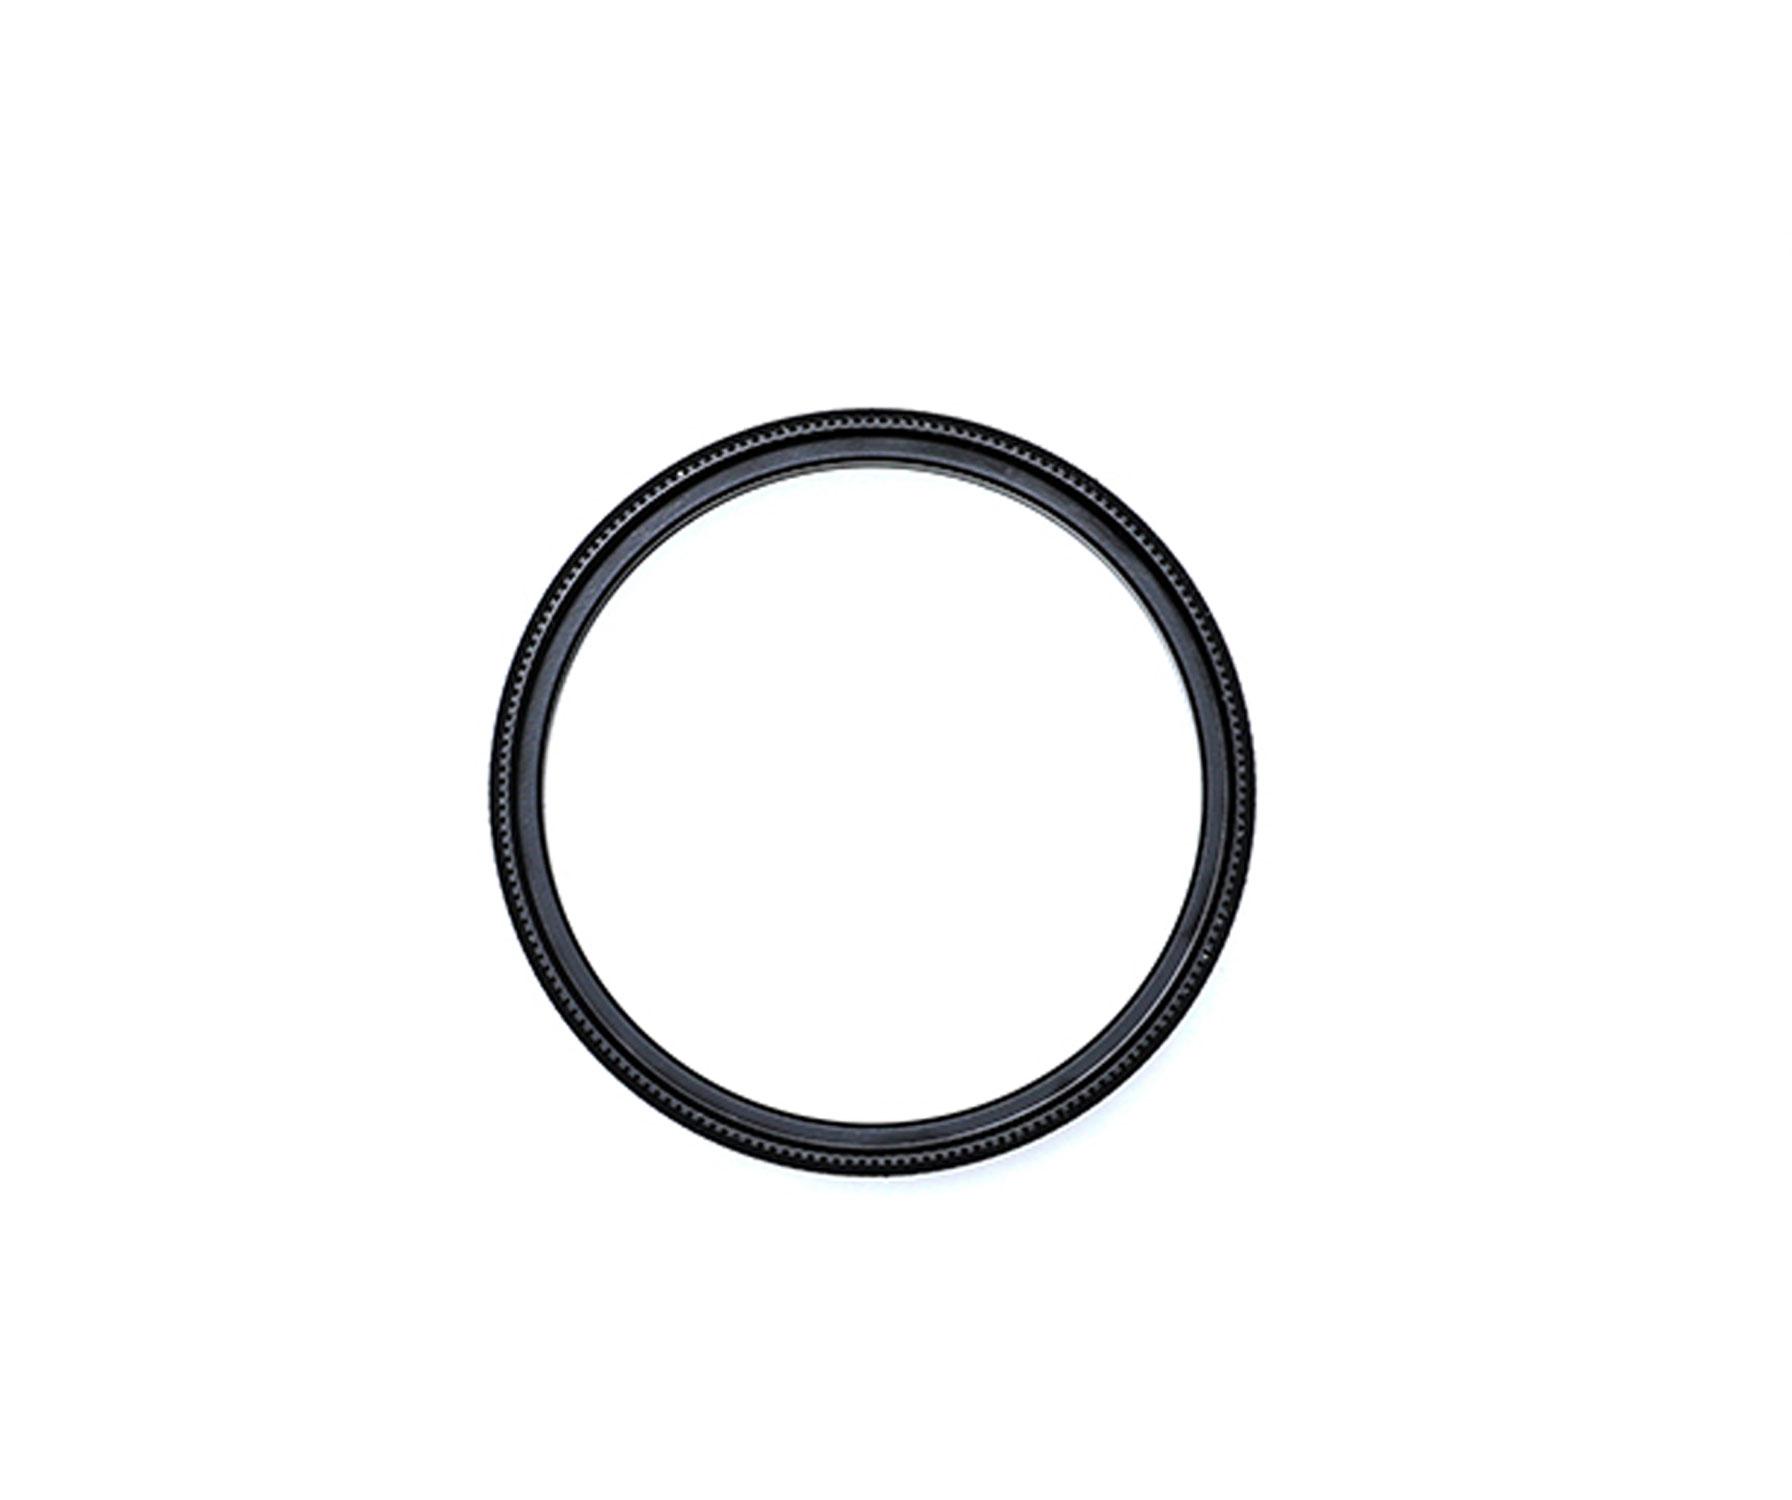 Zenmuse X5S Balancing Ring for Olympus M.Zuiko 45mm/1.8